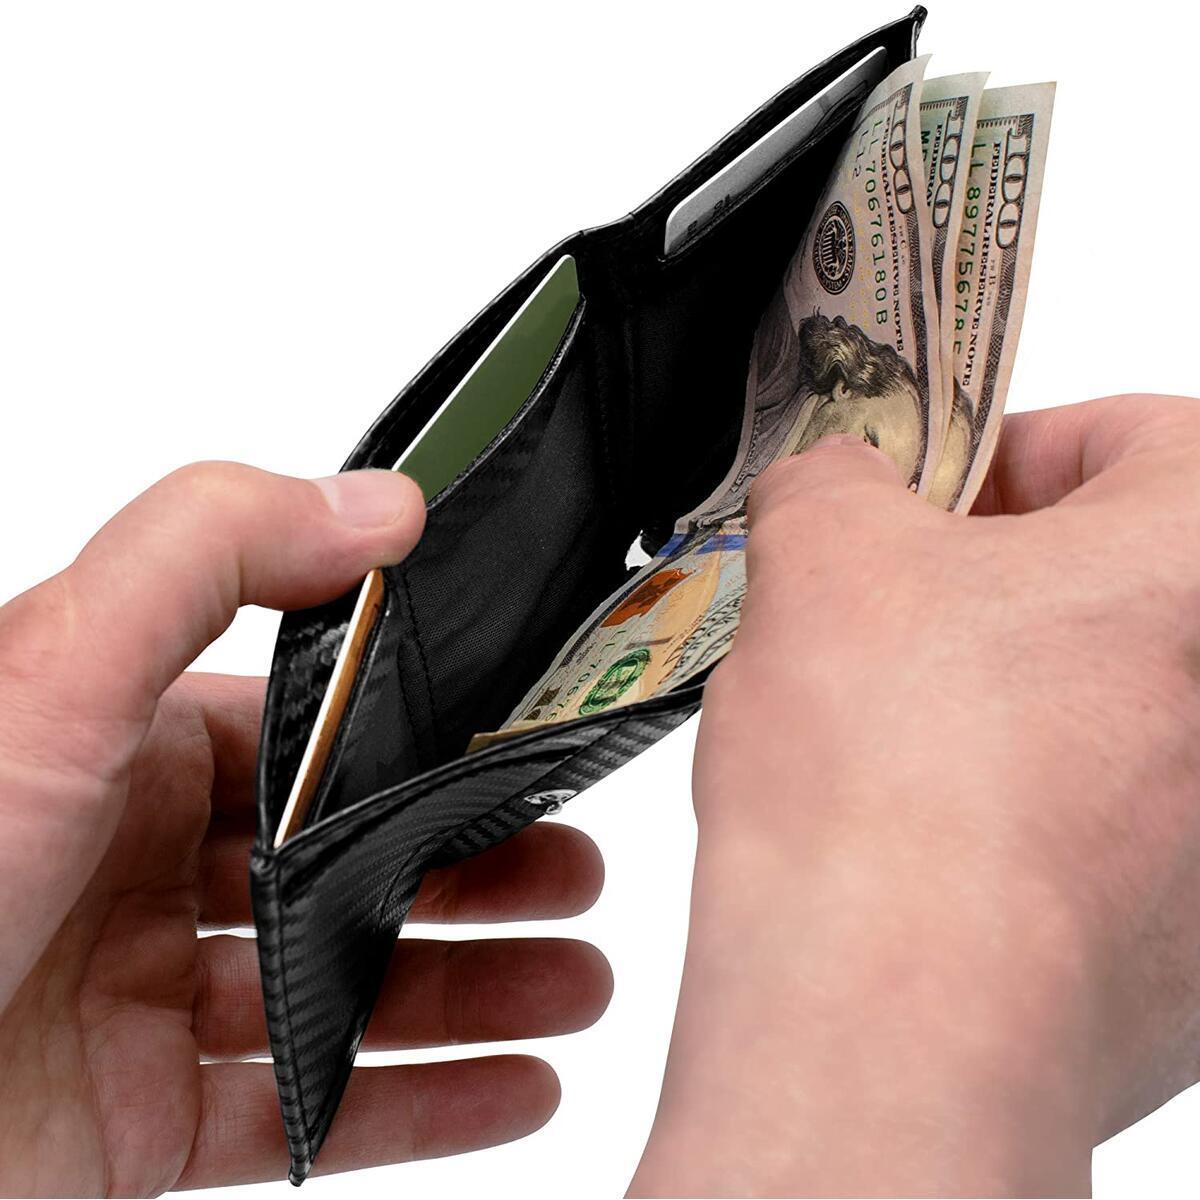 GenTo SMARTLET - Slim and Smart Wallet - RFID blocking - Minimalist front Pocket SW 103